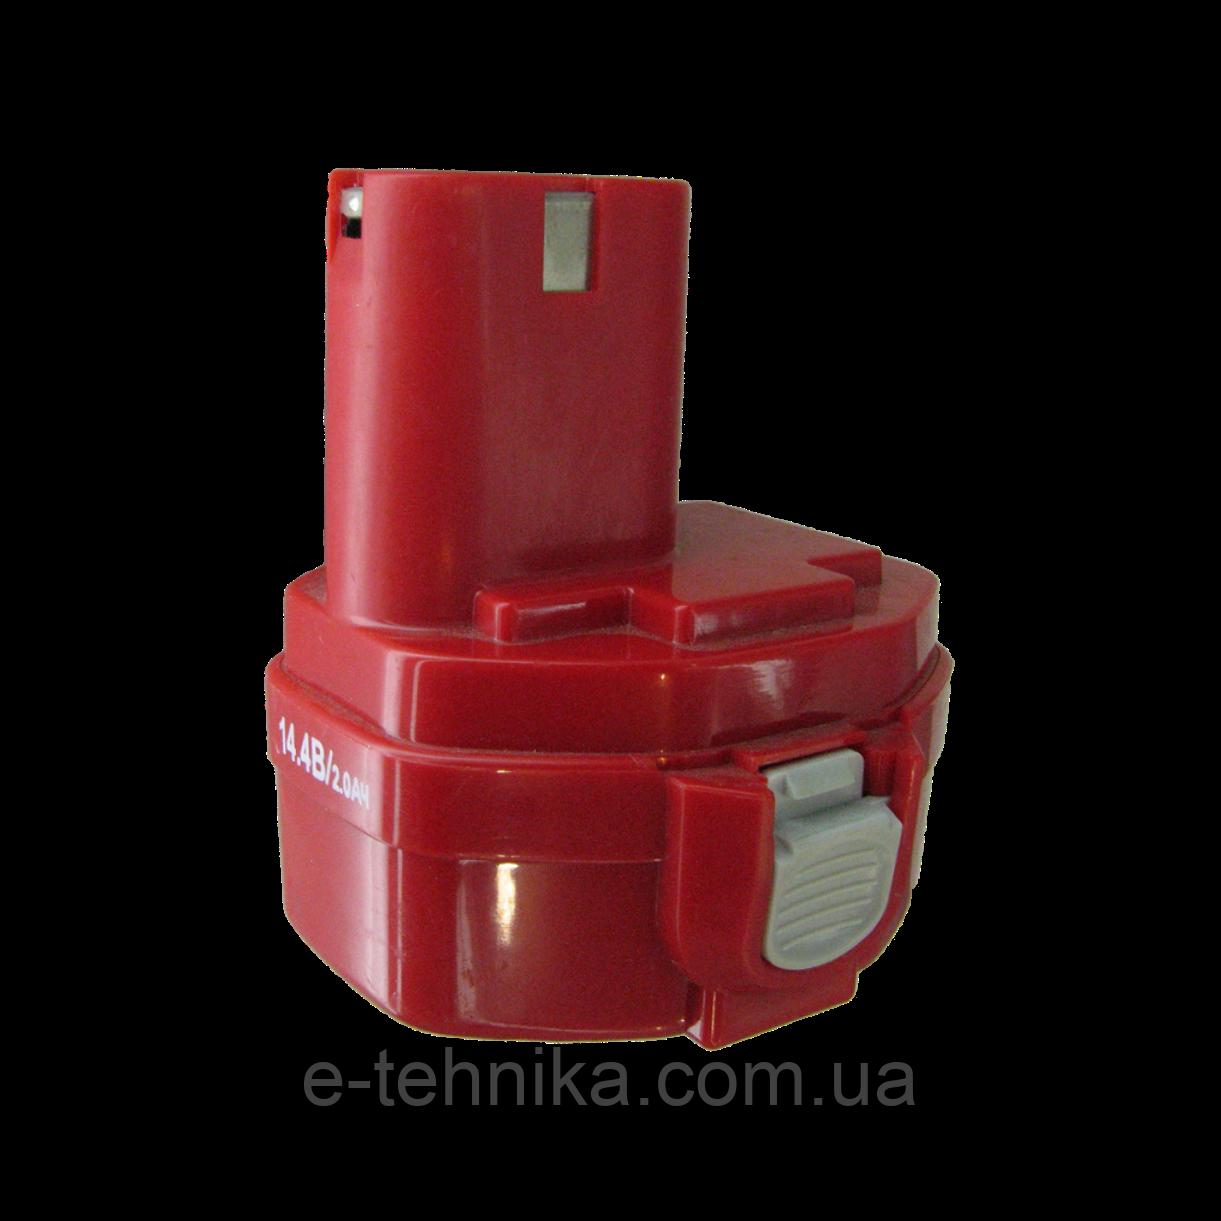 Аккумулятор для шуруповёрта Odwerk 14-2E